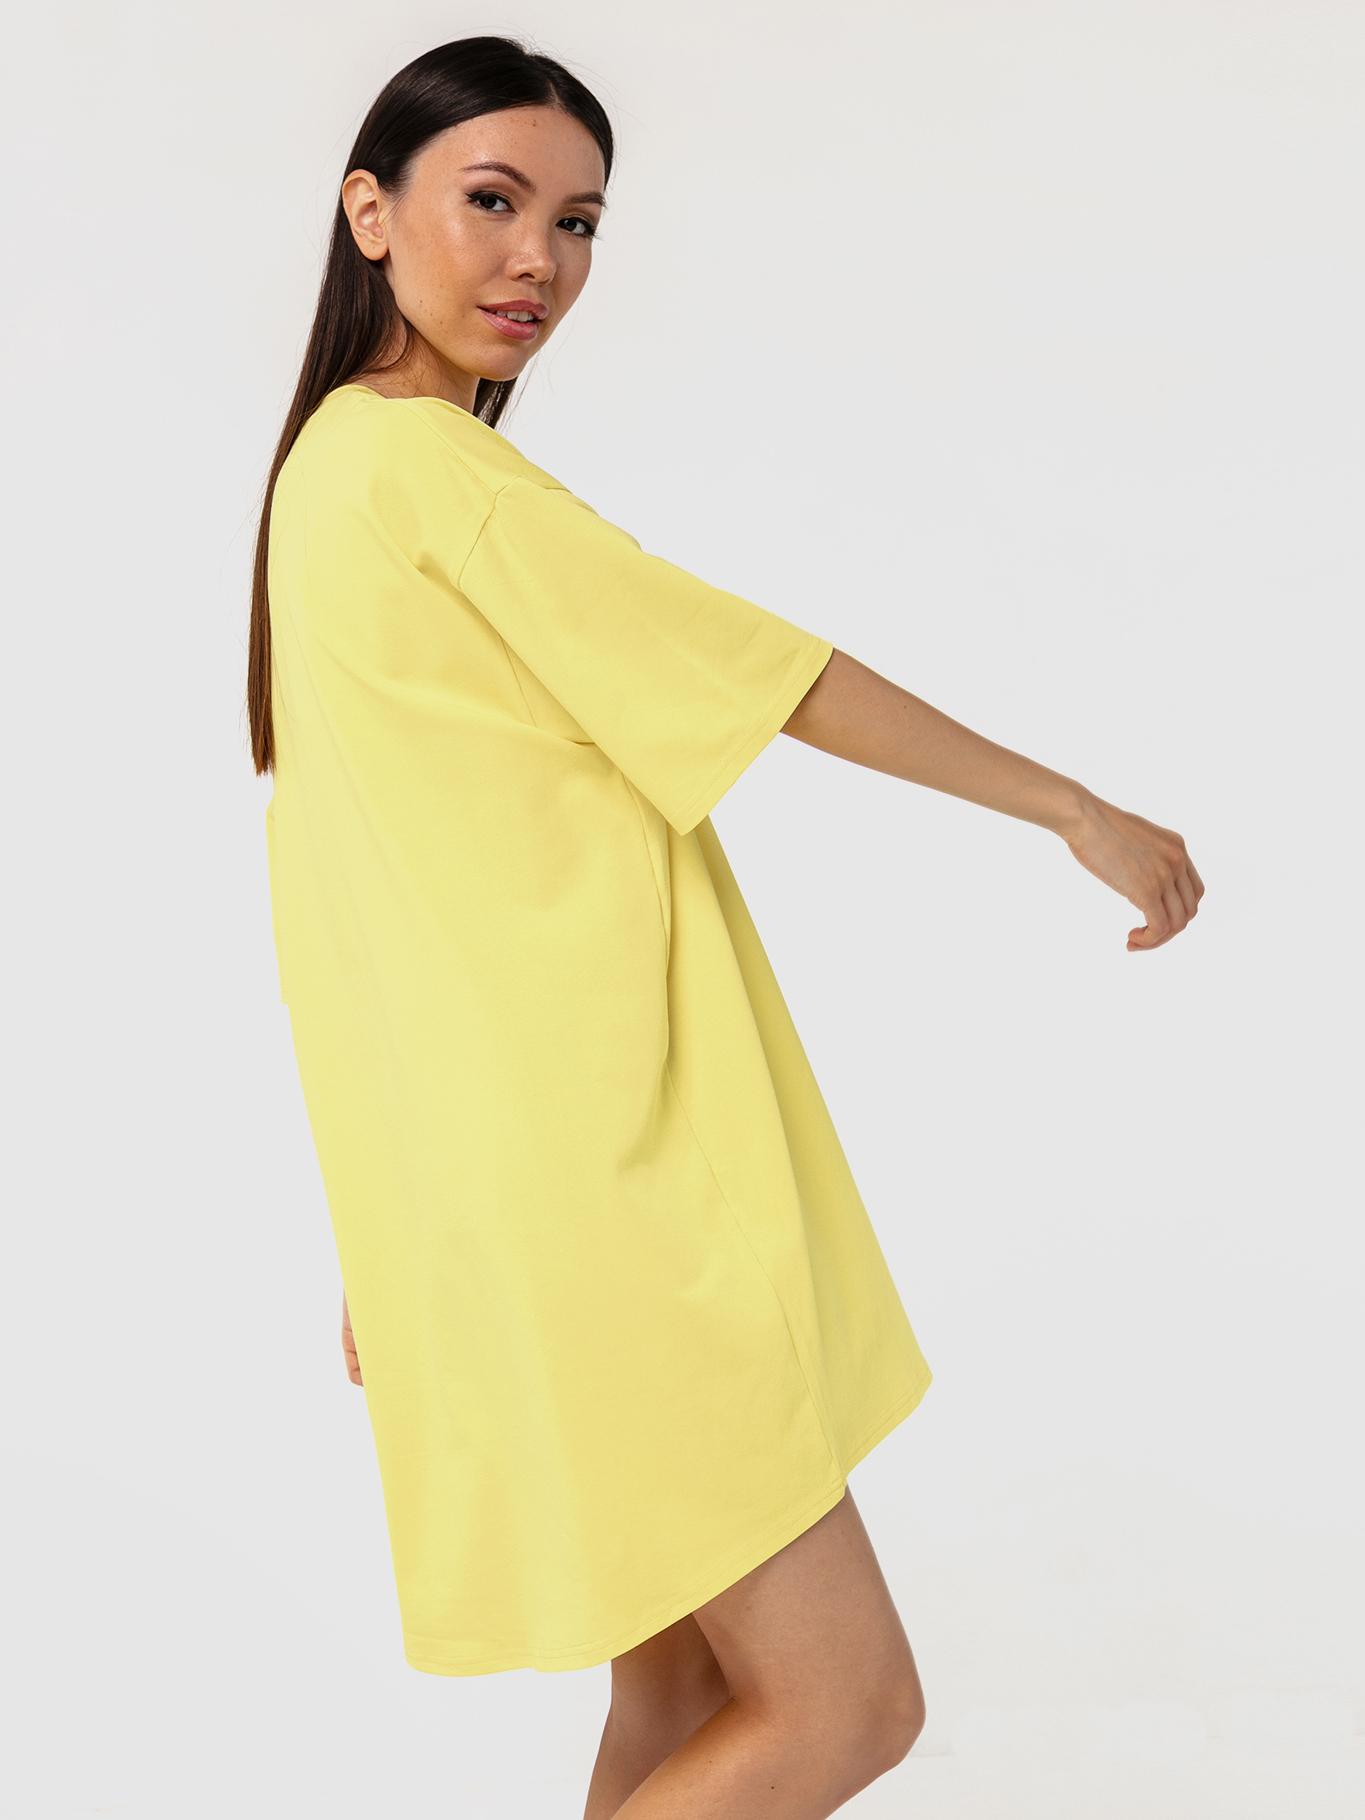 Платье-футболка хлопковое желтое YOS от украинского бренда Your Own Style